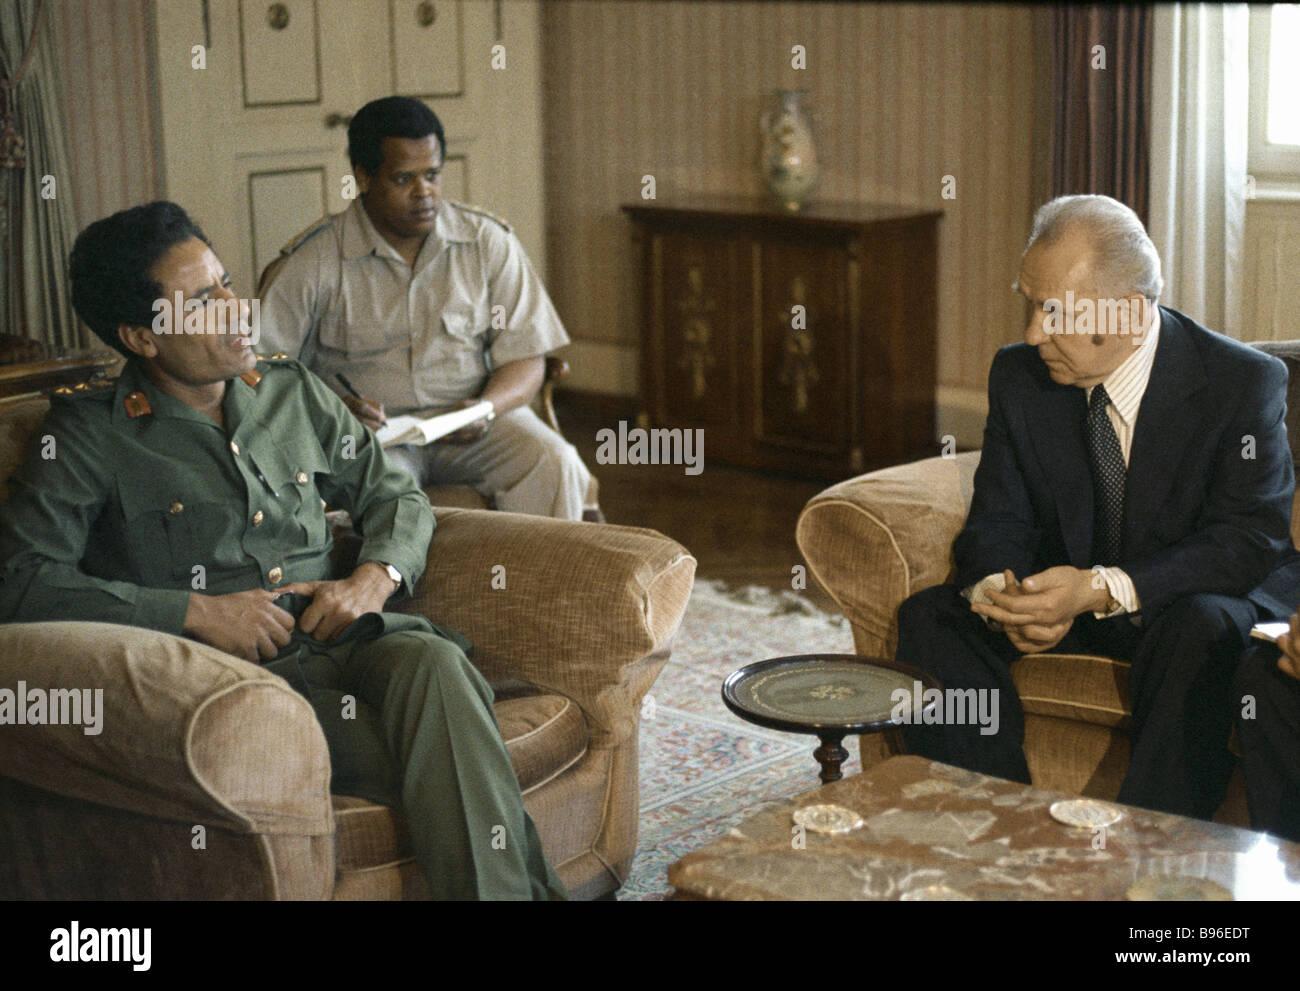 Soviet Prime Minister Alexei Kosygin right meets Libyan leader Muammar al Gaddafi - Stock Image